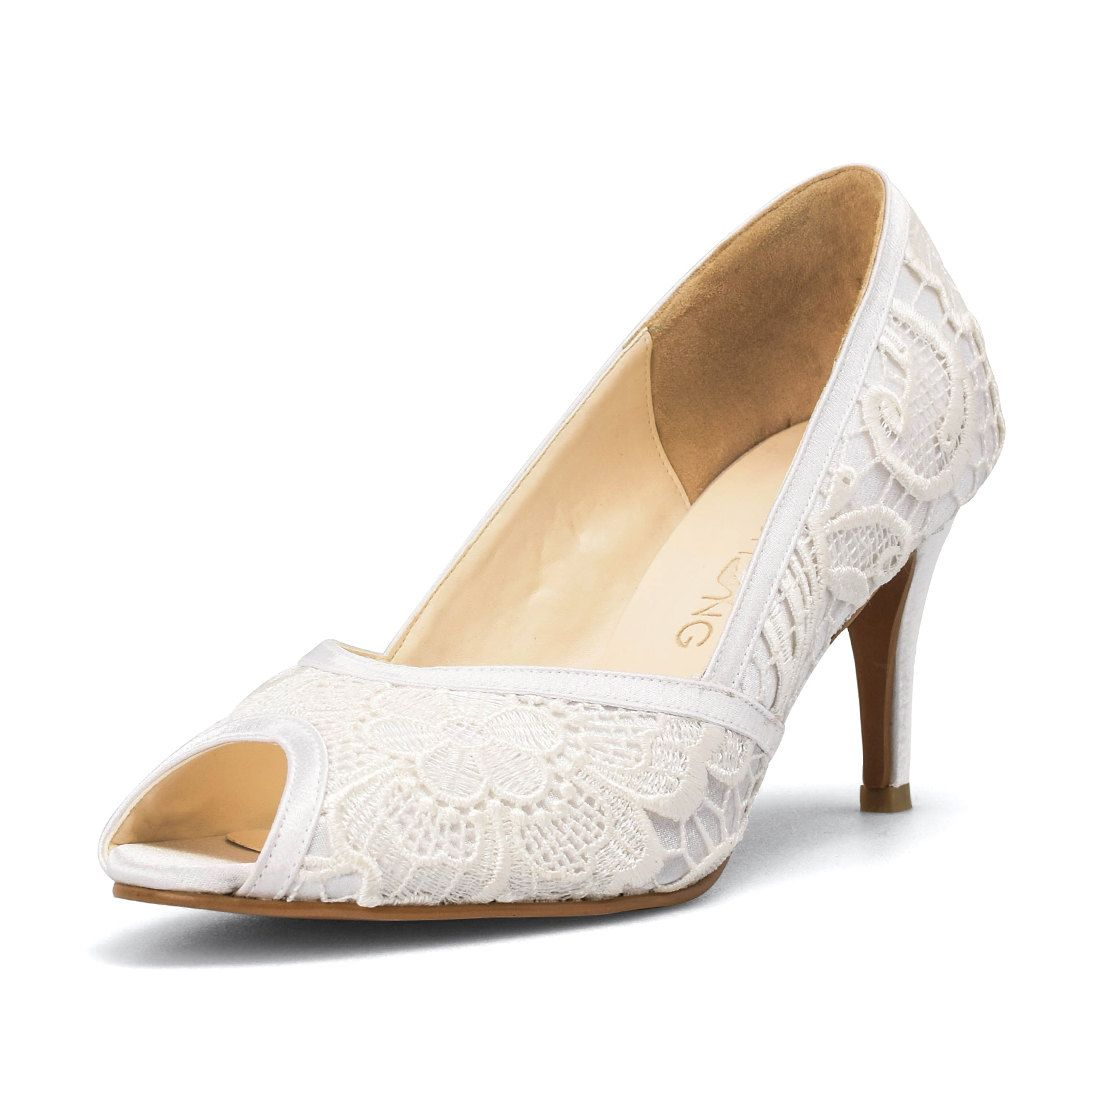 White Cord Lace Wedding Heels Custom Made Heels White Kitten